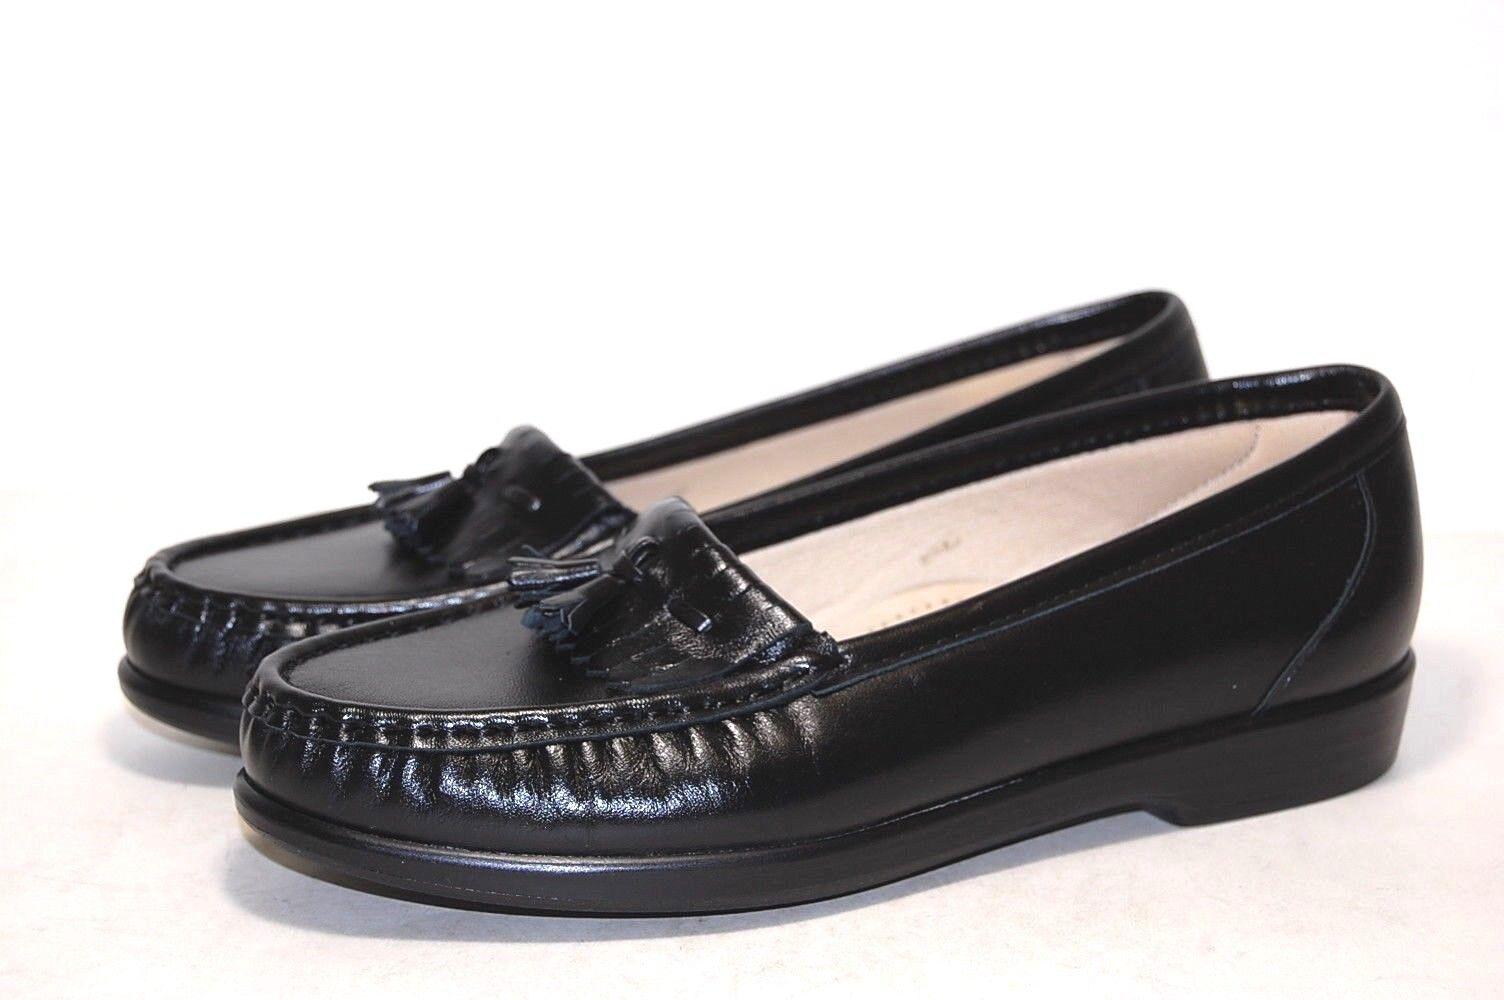 SAS Wouomo Softie Lofer nero Leather scarpe  0073 -013 Wide  vendita calda online